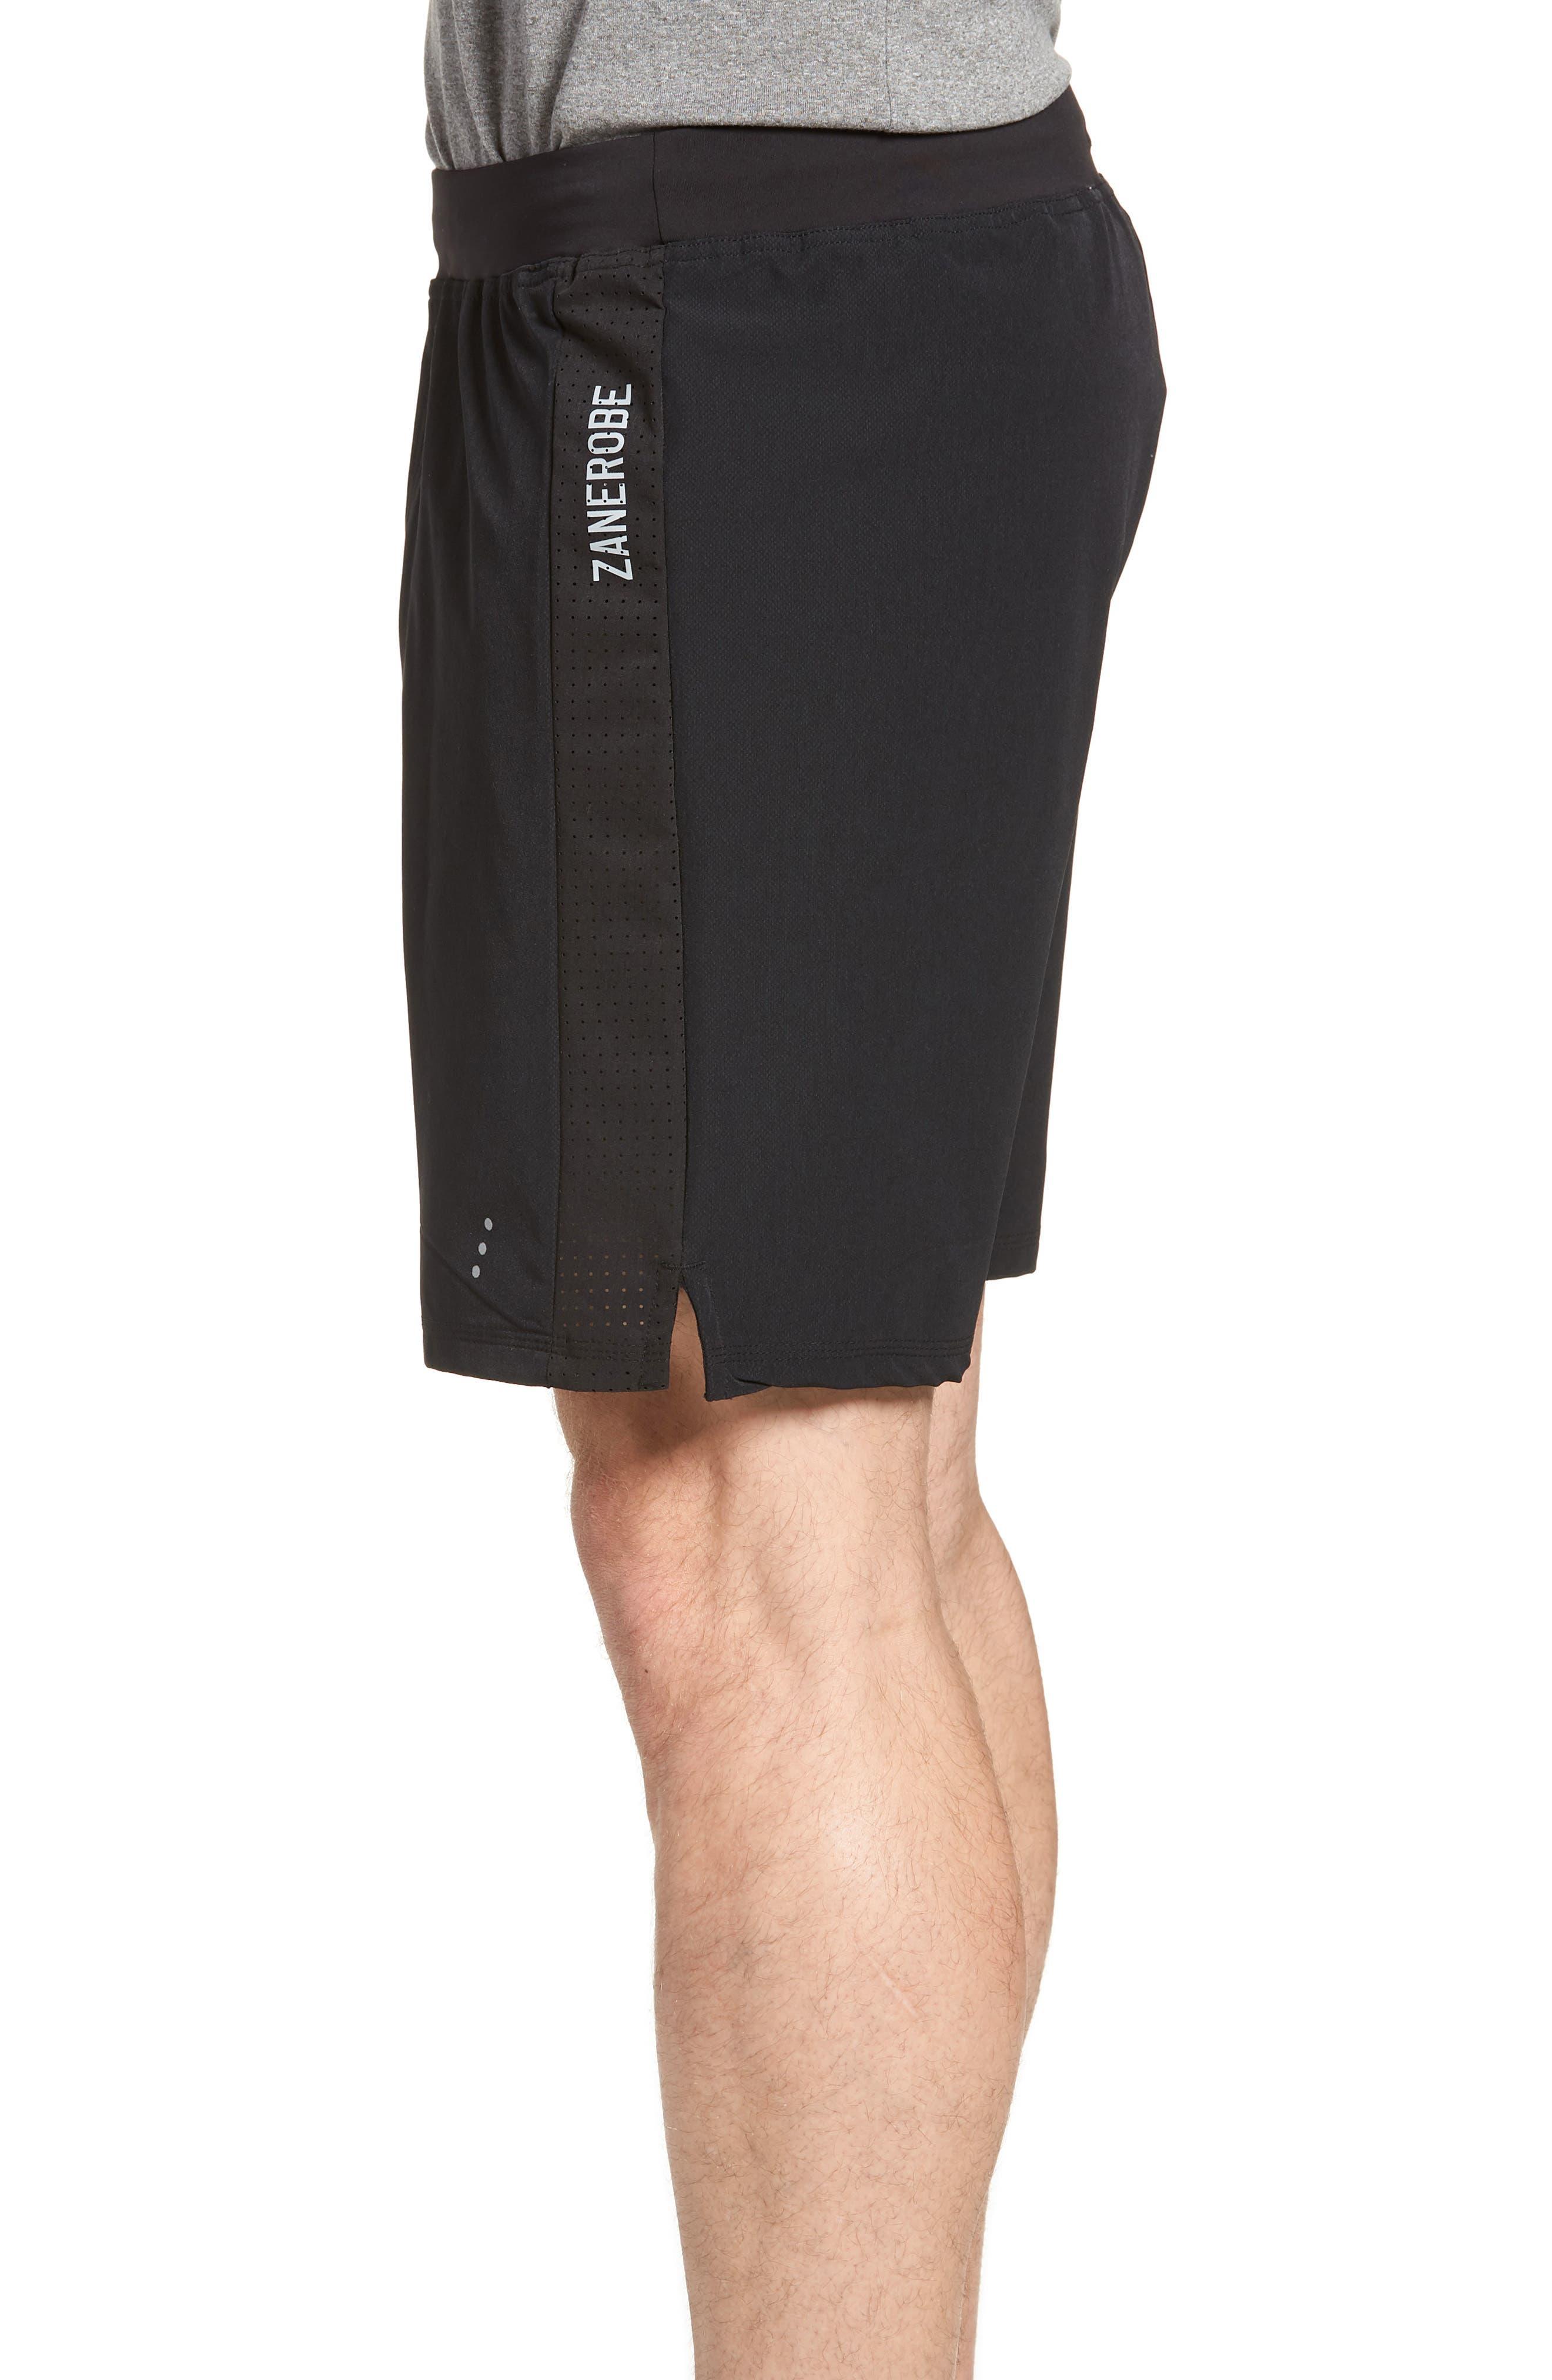 ZANEROBE Type 1 Shorts,                             Alternate thumbnail 4, color,                             001